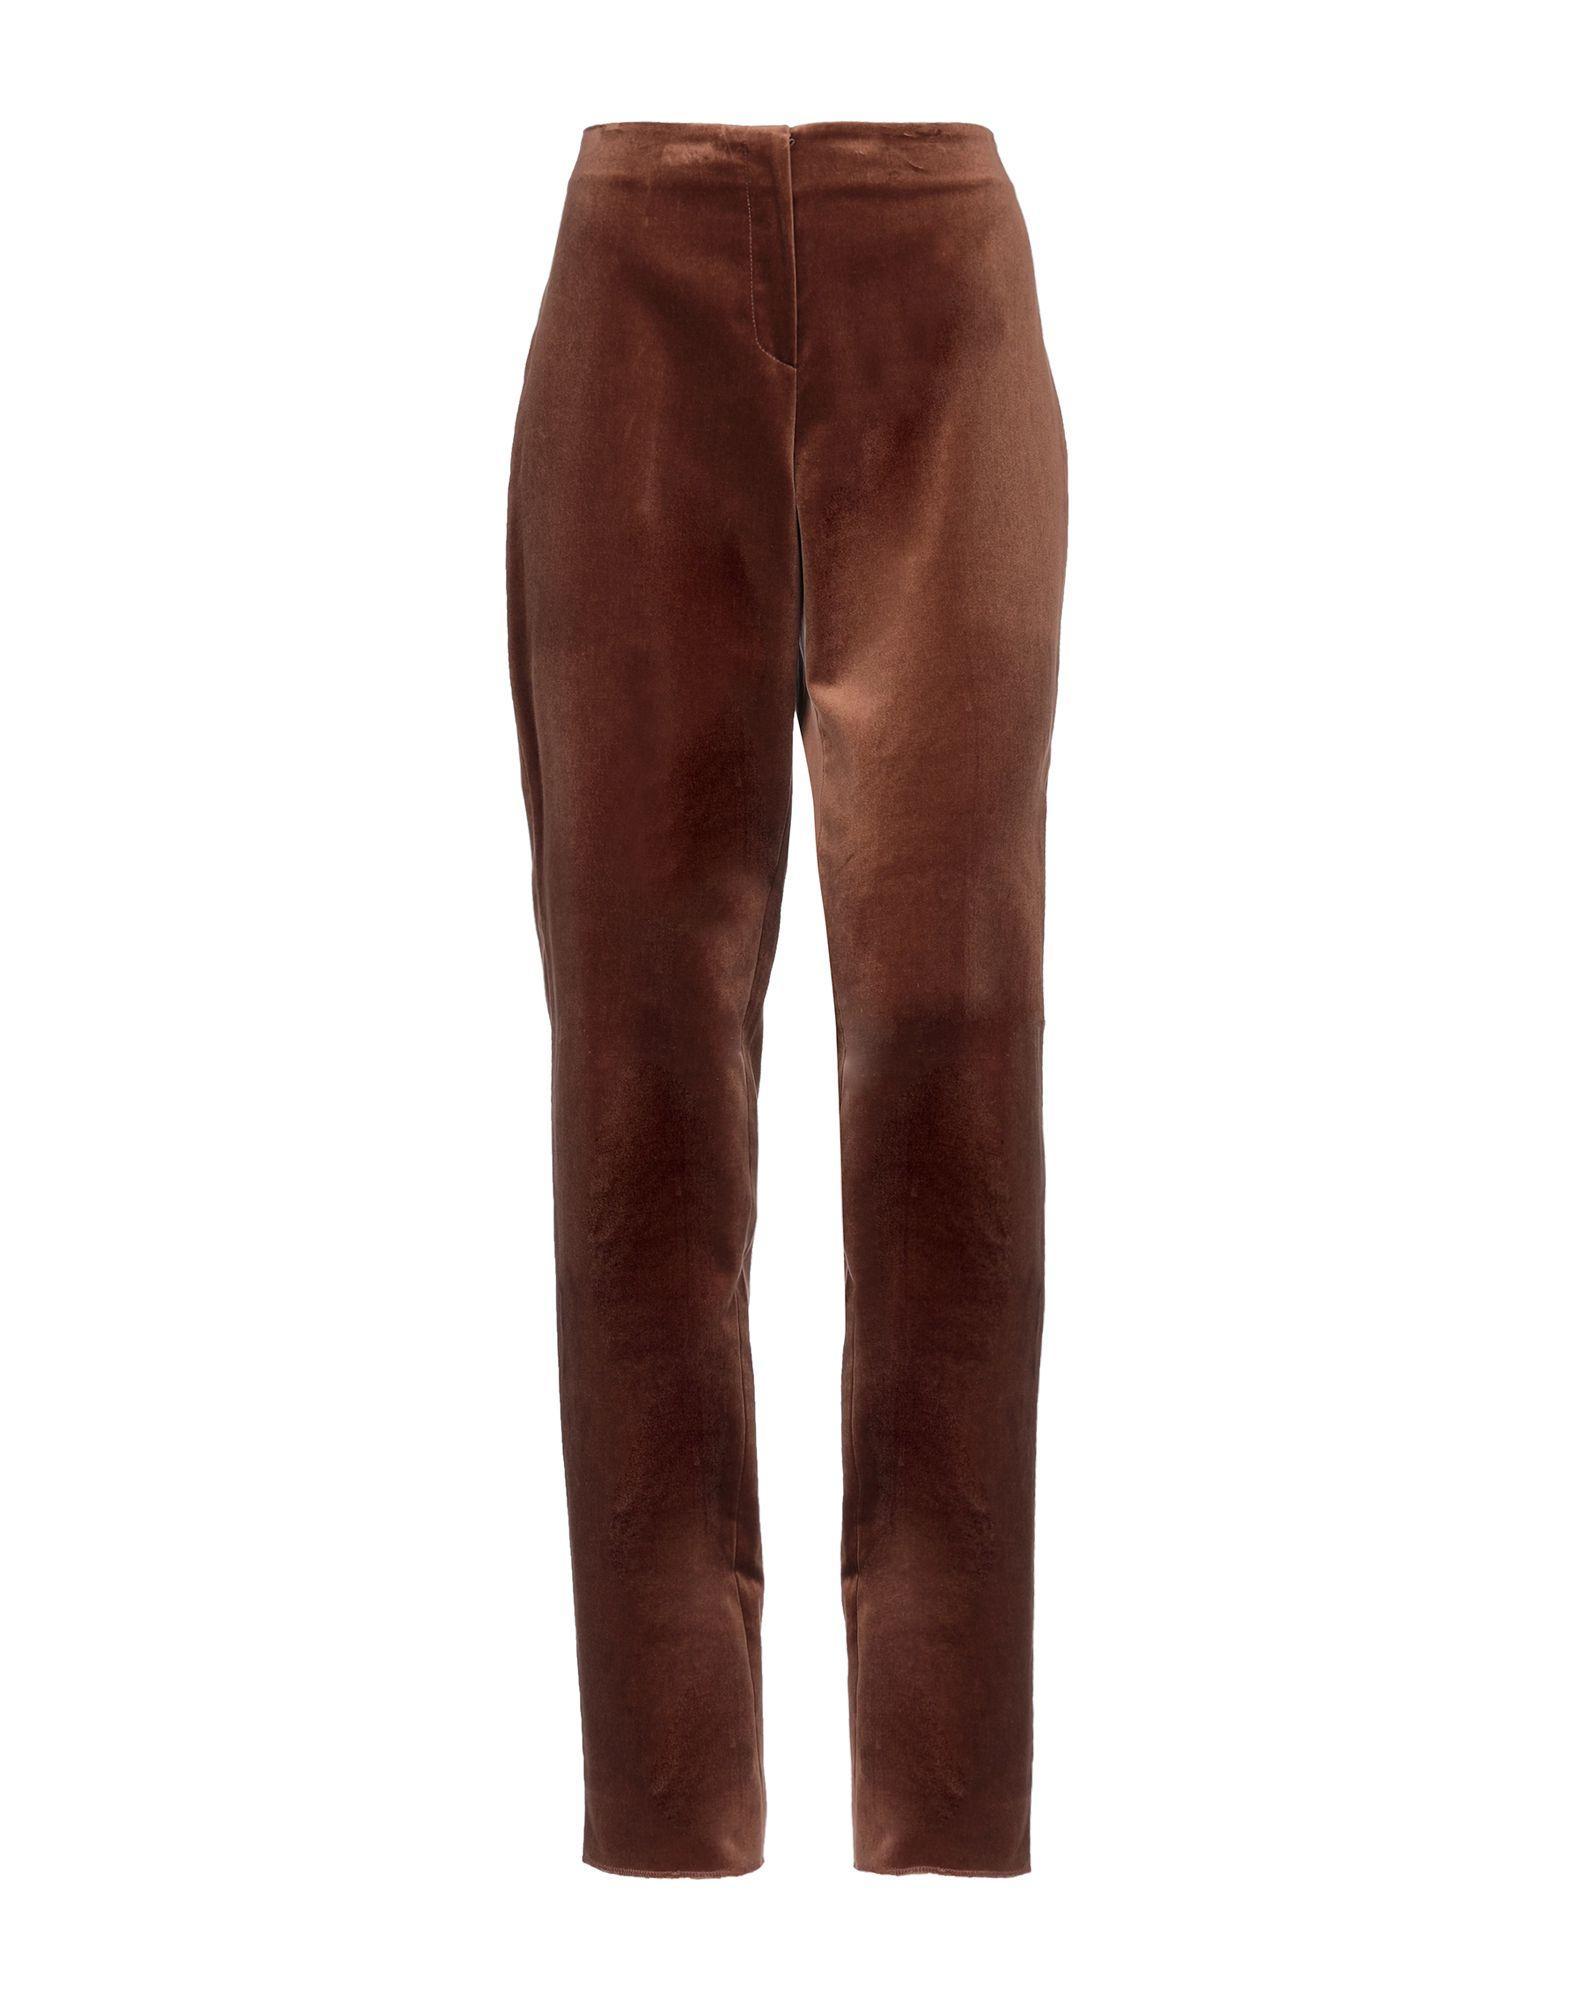 BLUMARINE Damen Hose Farbe Braun Größe 6